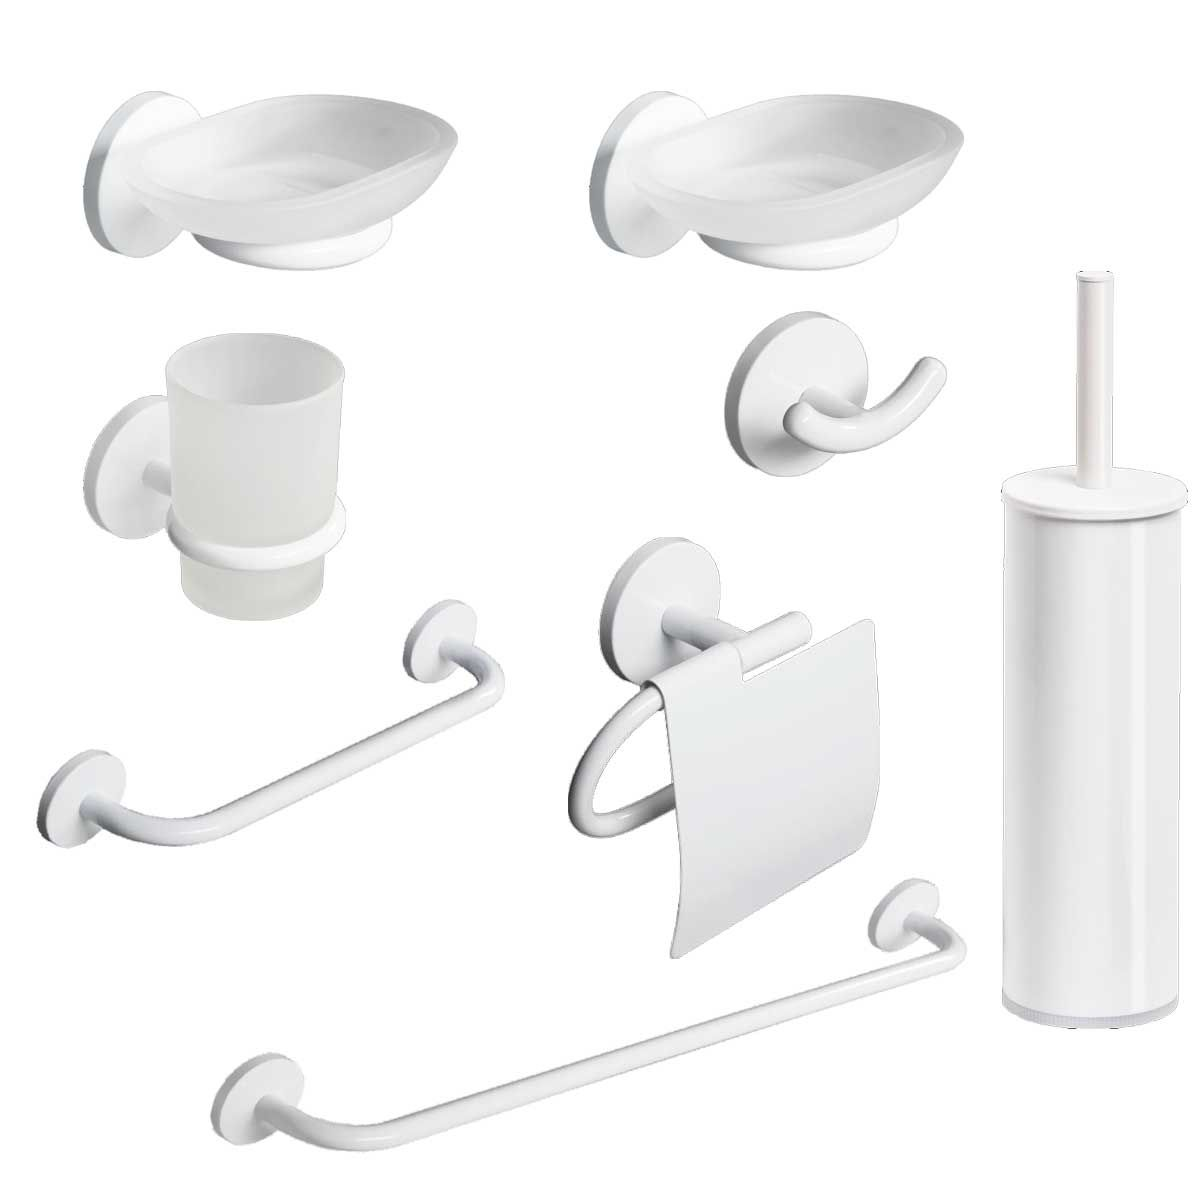 kit accessori bagno one duo bianca 8 pezzi metaform - Kit Arredo Bagno